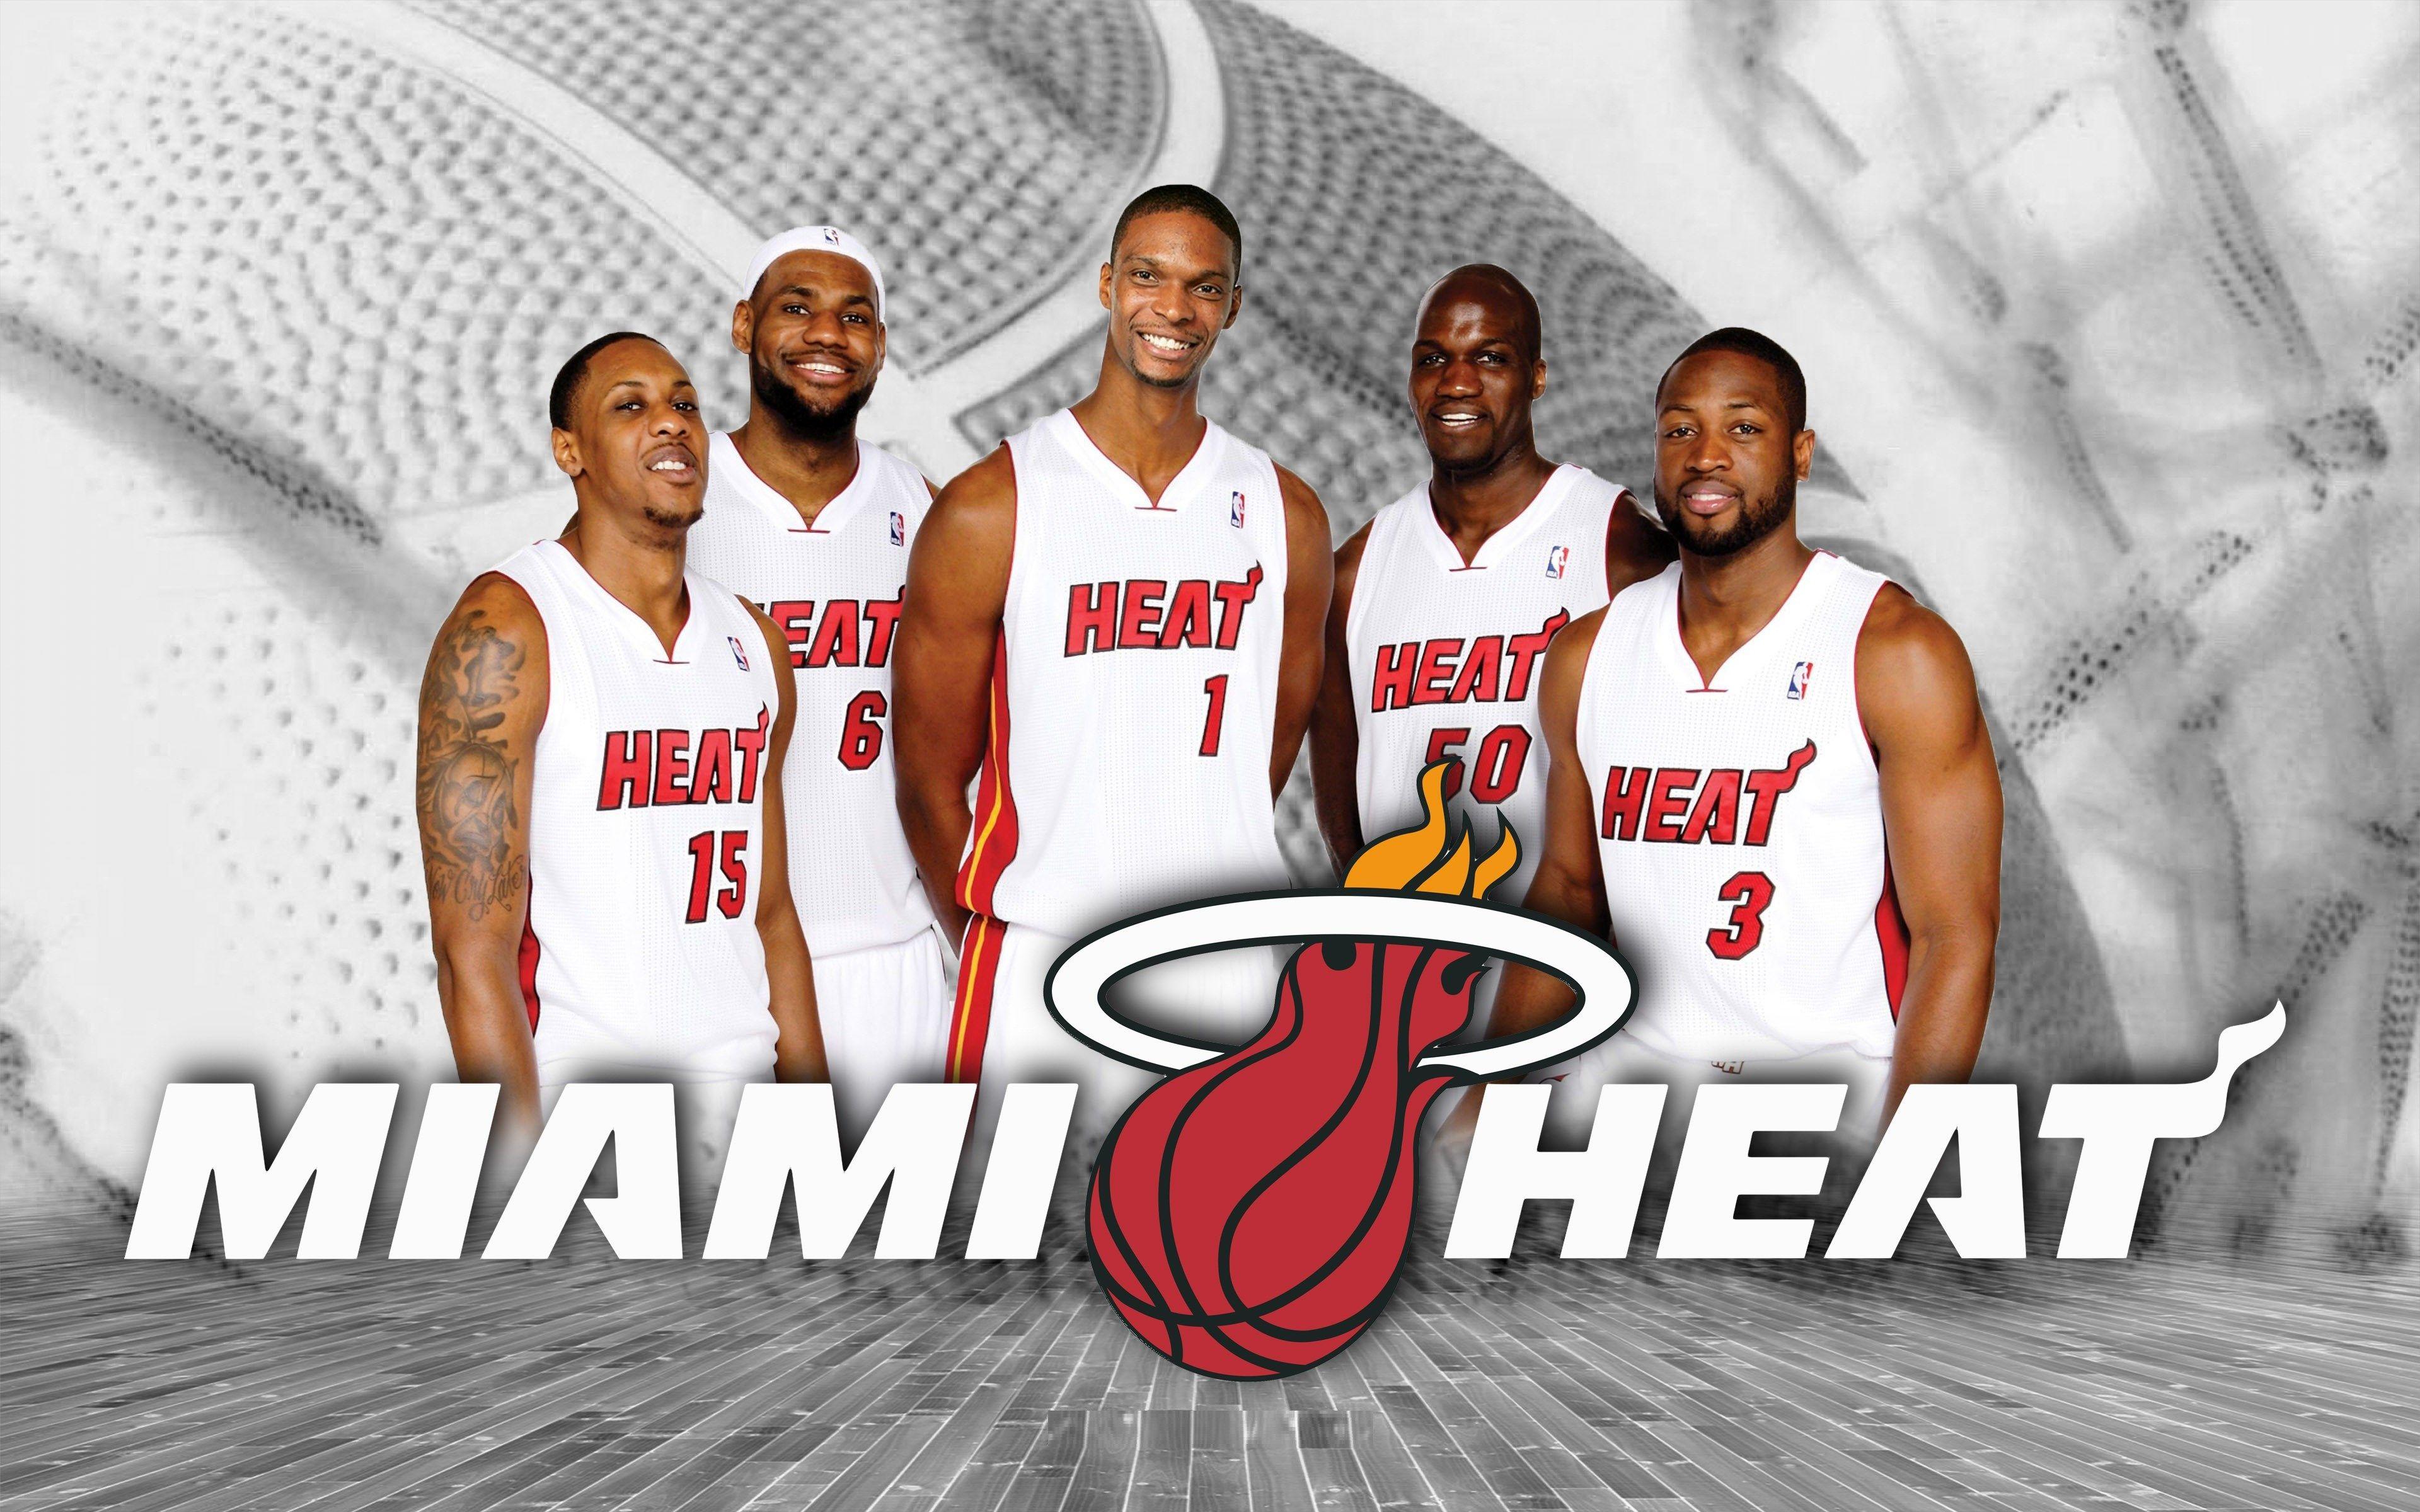 Miami Heat Starting Lineup Nba Wallpaper Nba Miami Heat Miami Heat Miami